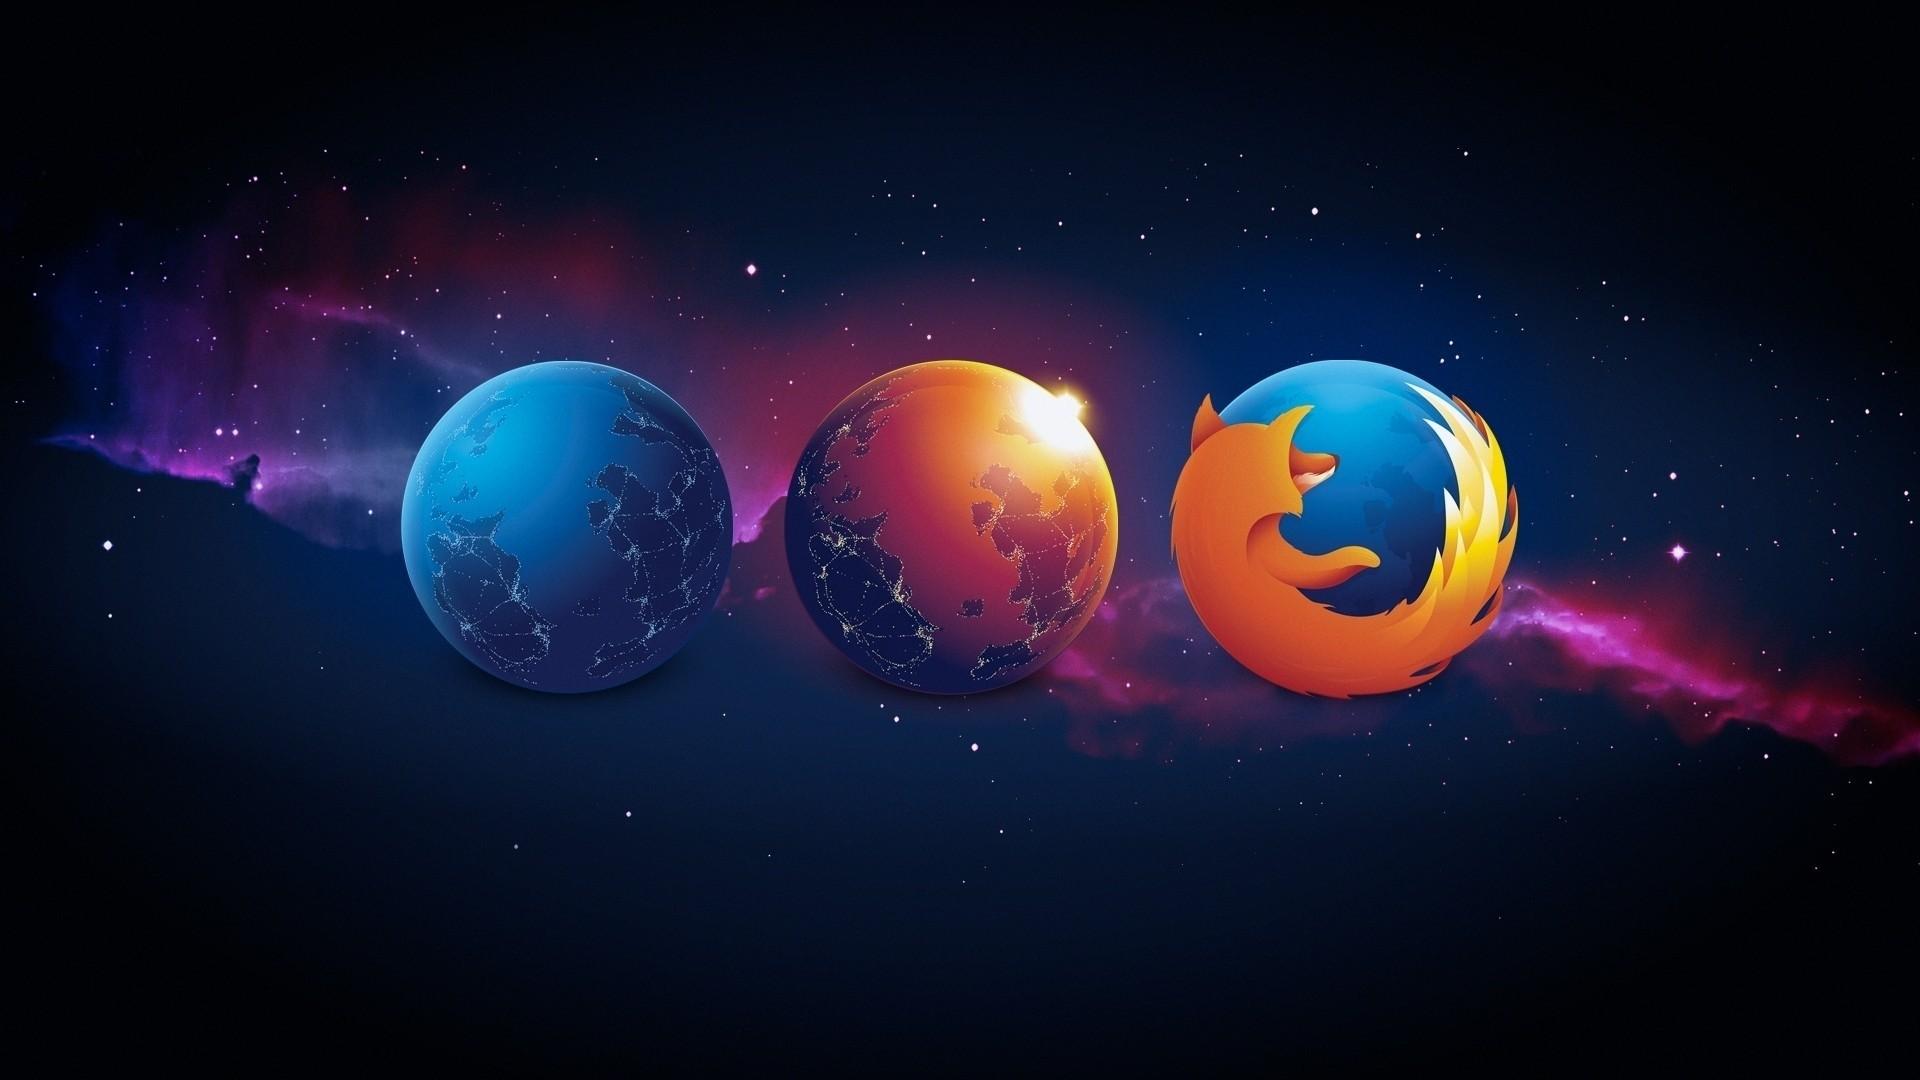 1920x1080 Px Digital Art Mozilla Firefox Space